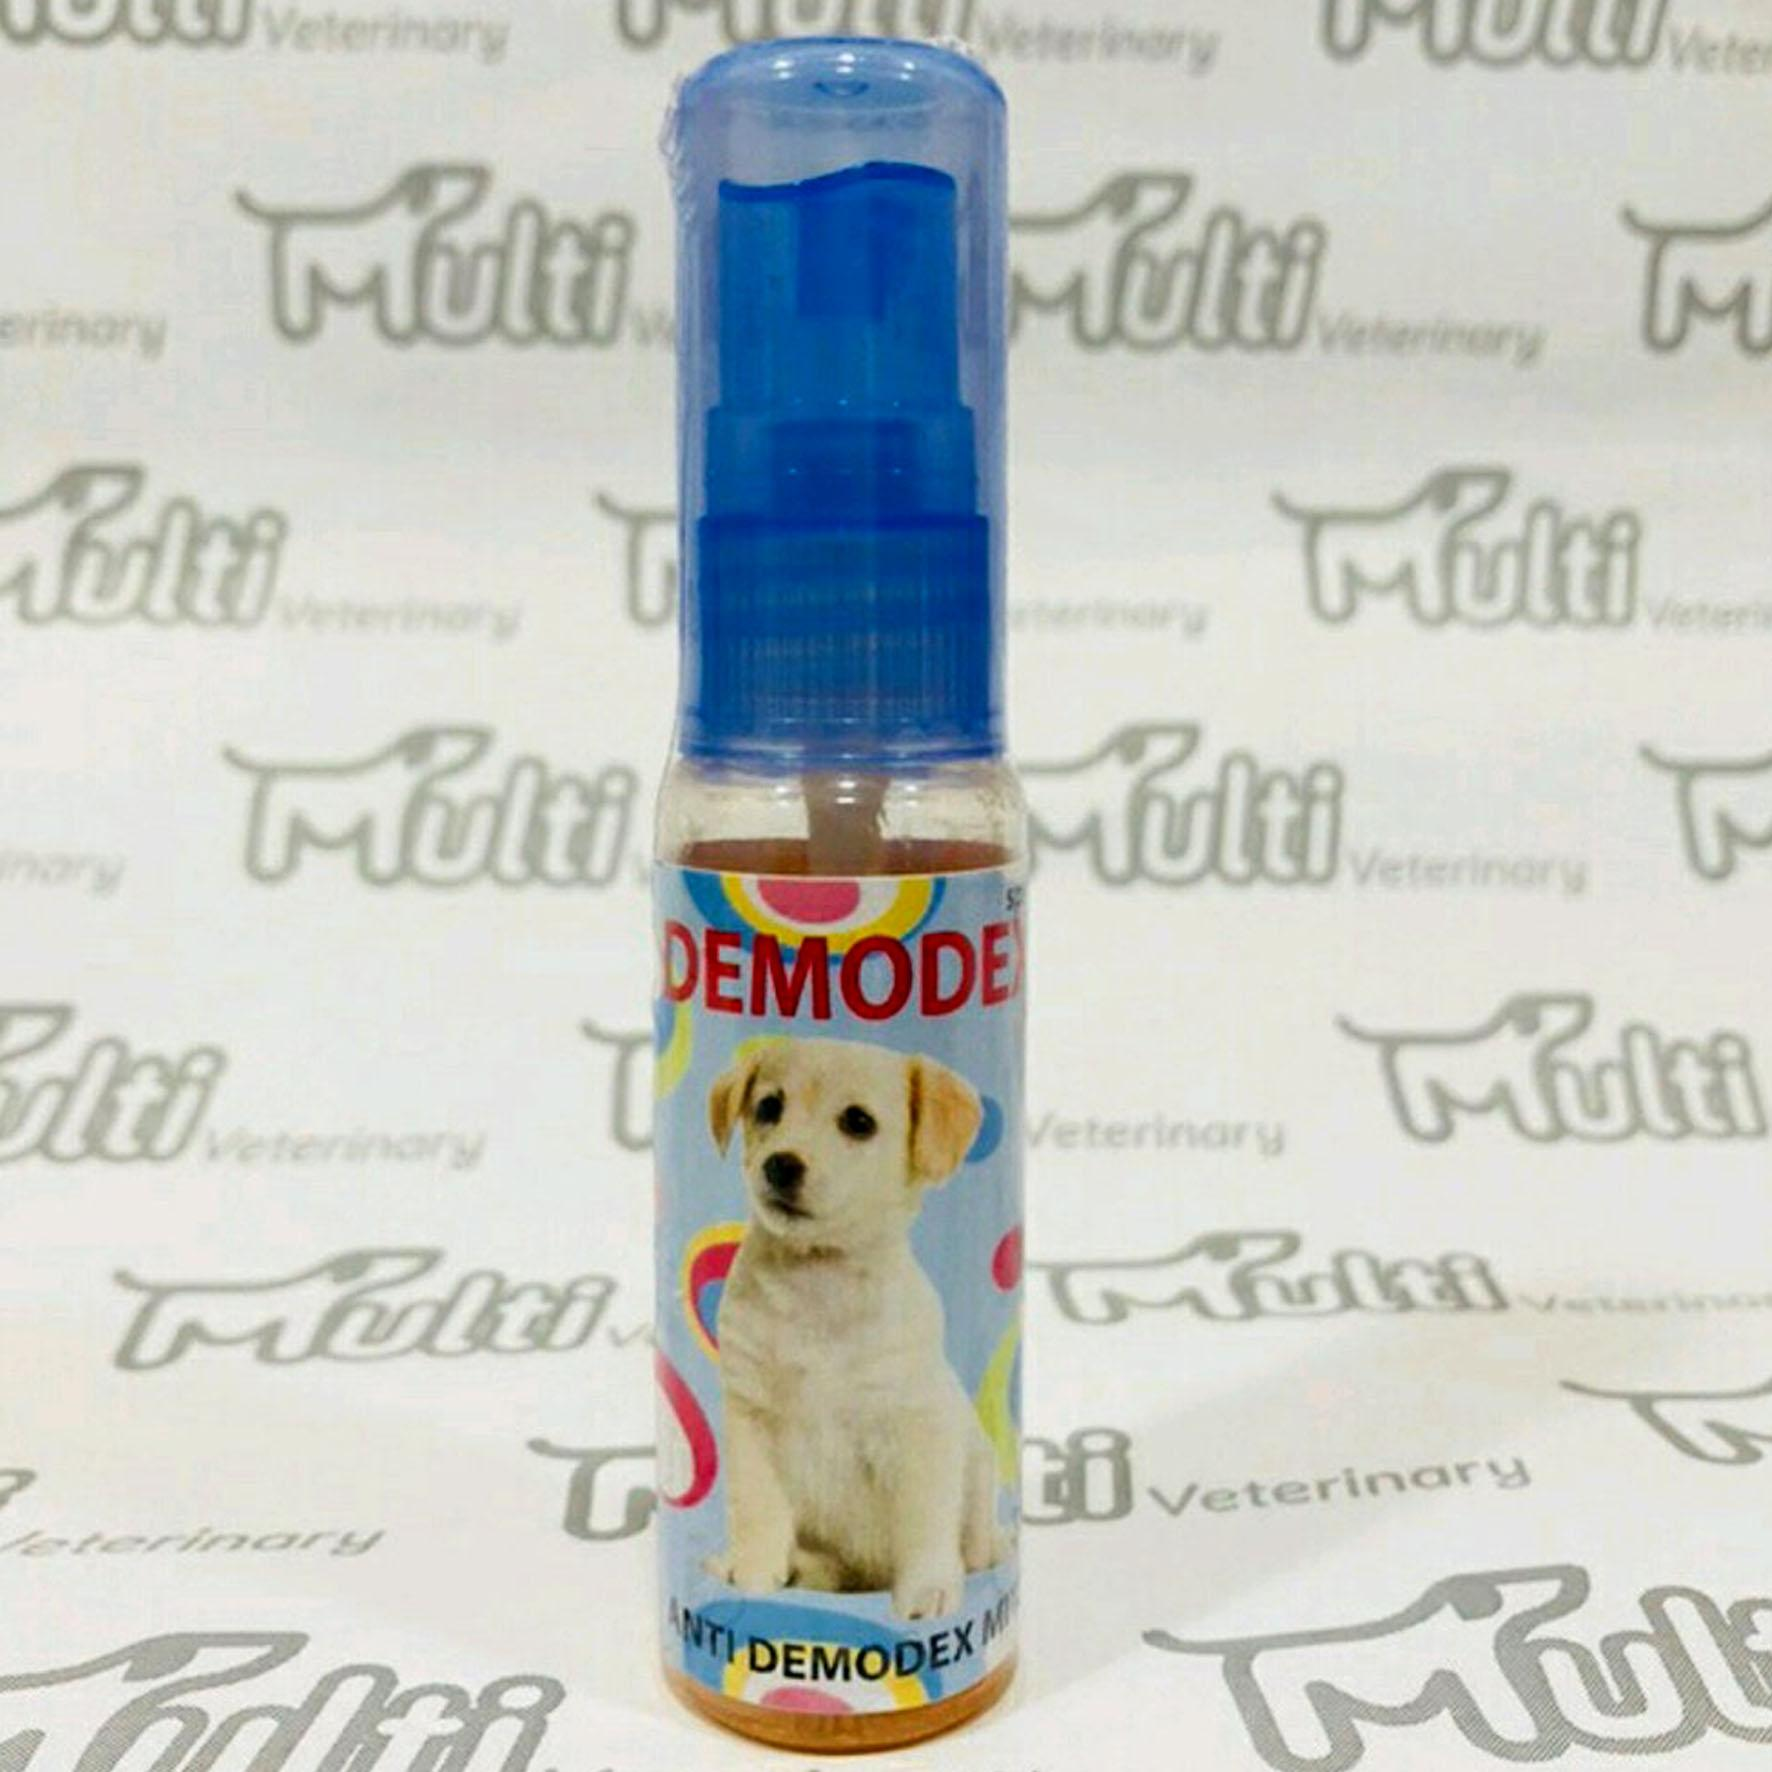 Buy Sell Cheapest Freshc Obat Spray Best Quality Product Deals Durevel Kutu Anjing Demodex 30 Ml Anti Mites Pada Dog